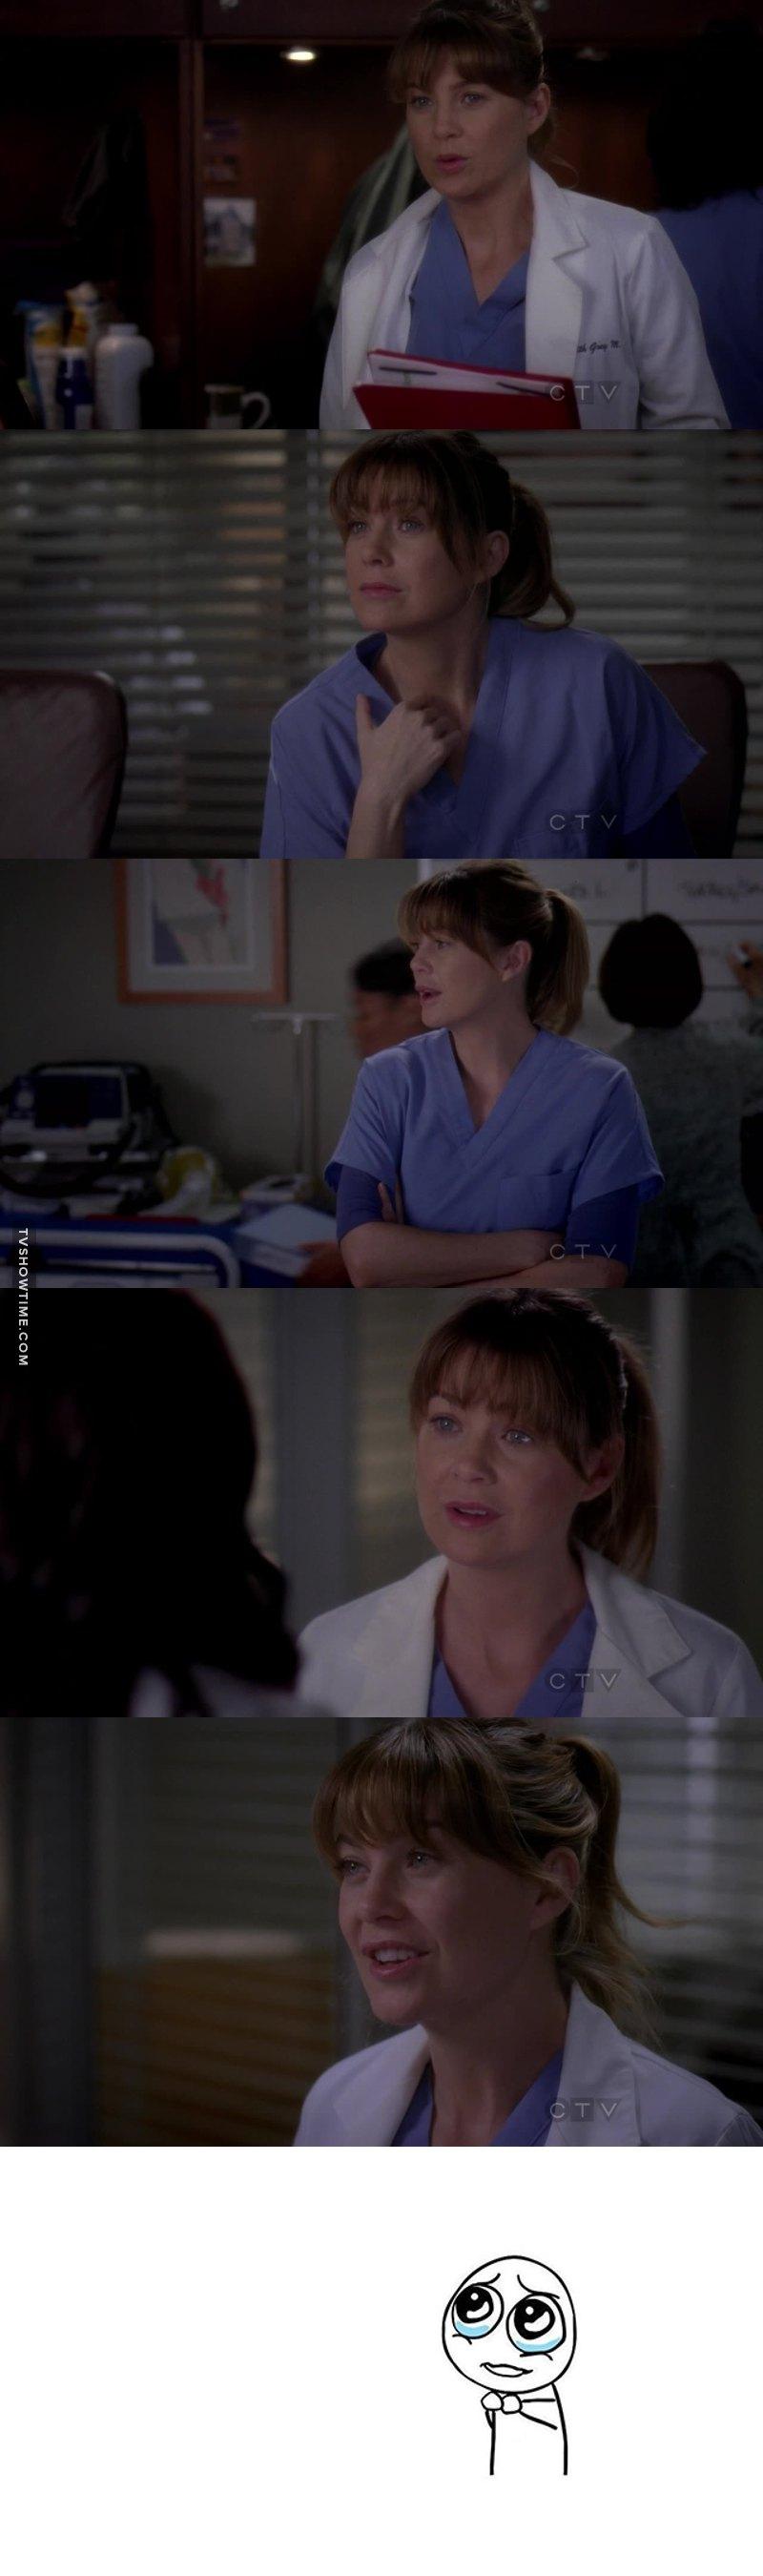 Só digo que a Meredith fica linda de cabelo amarrado ❤